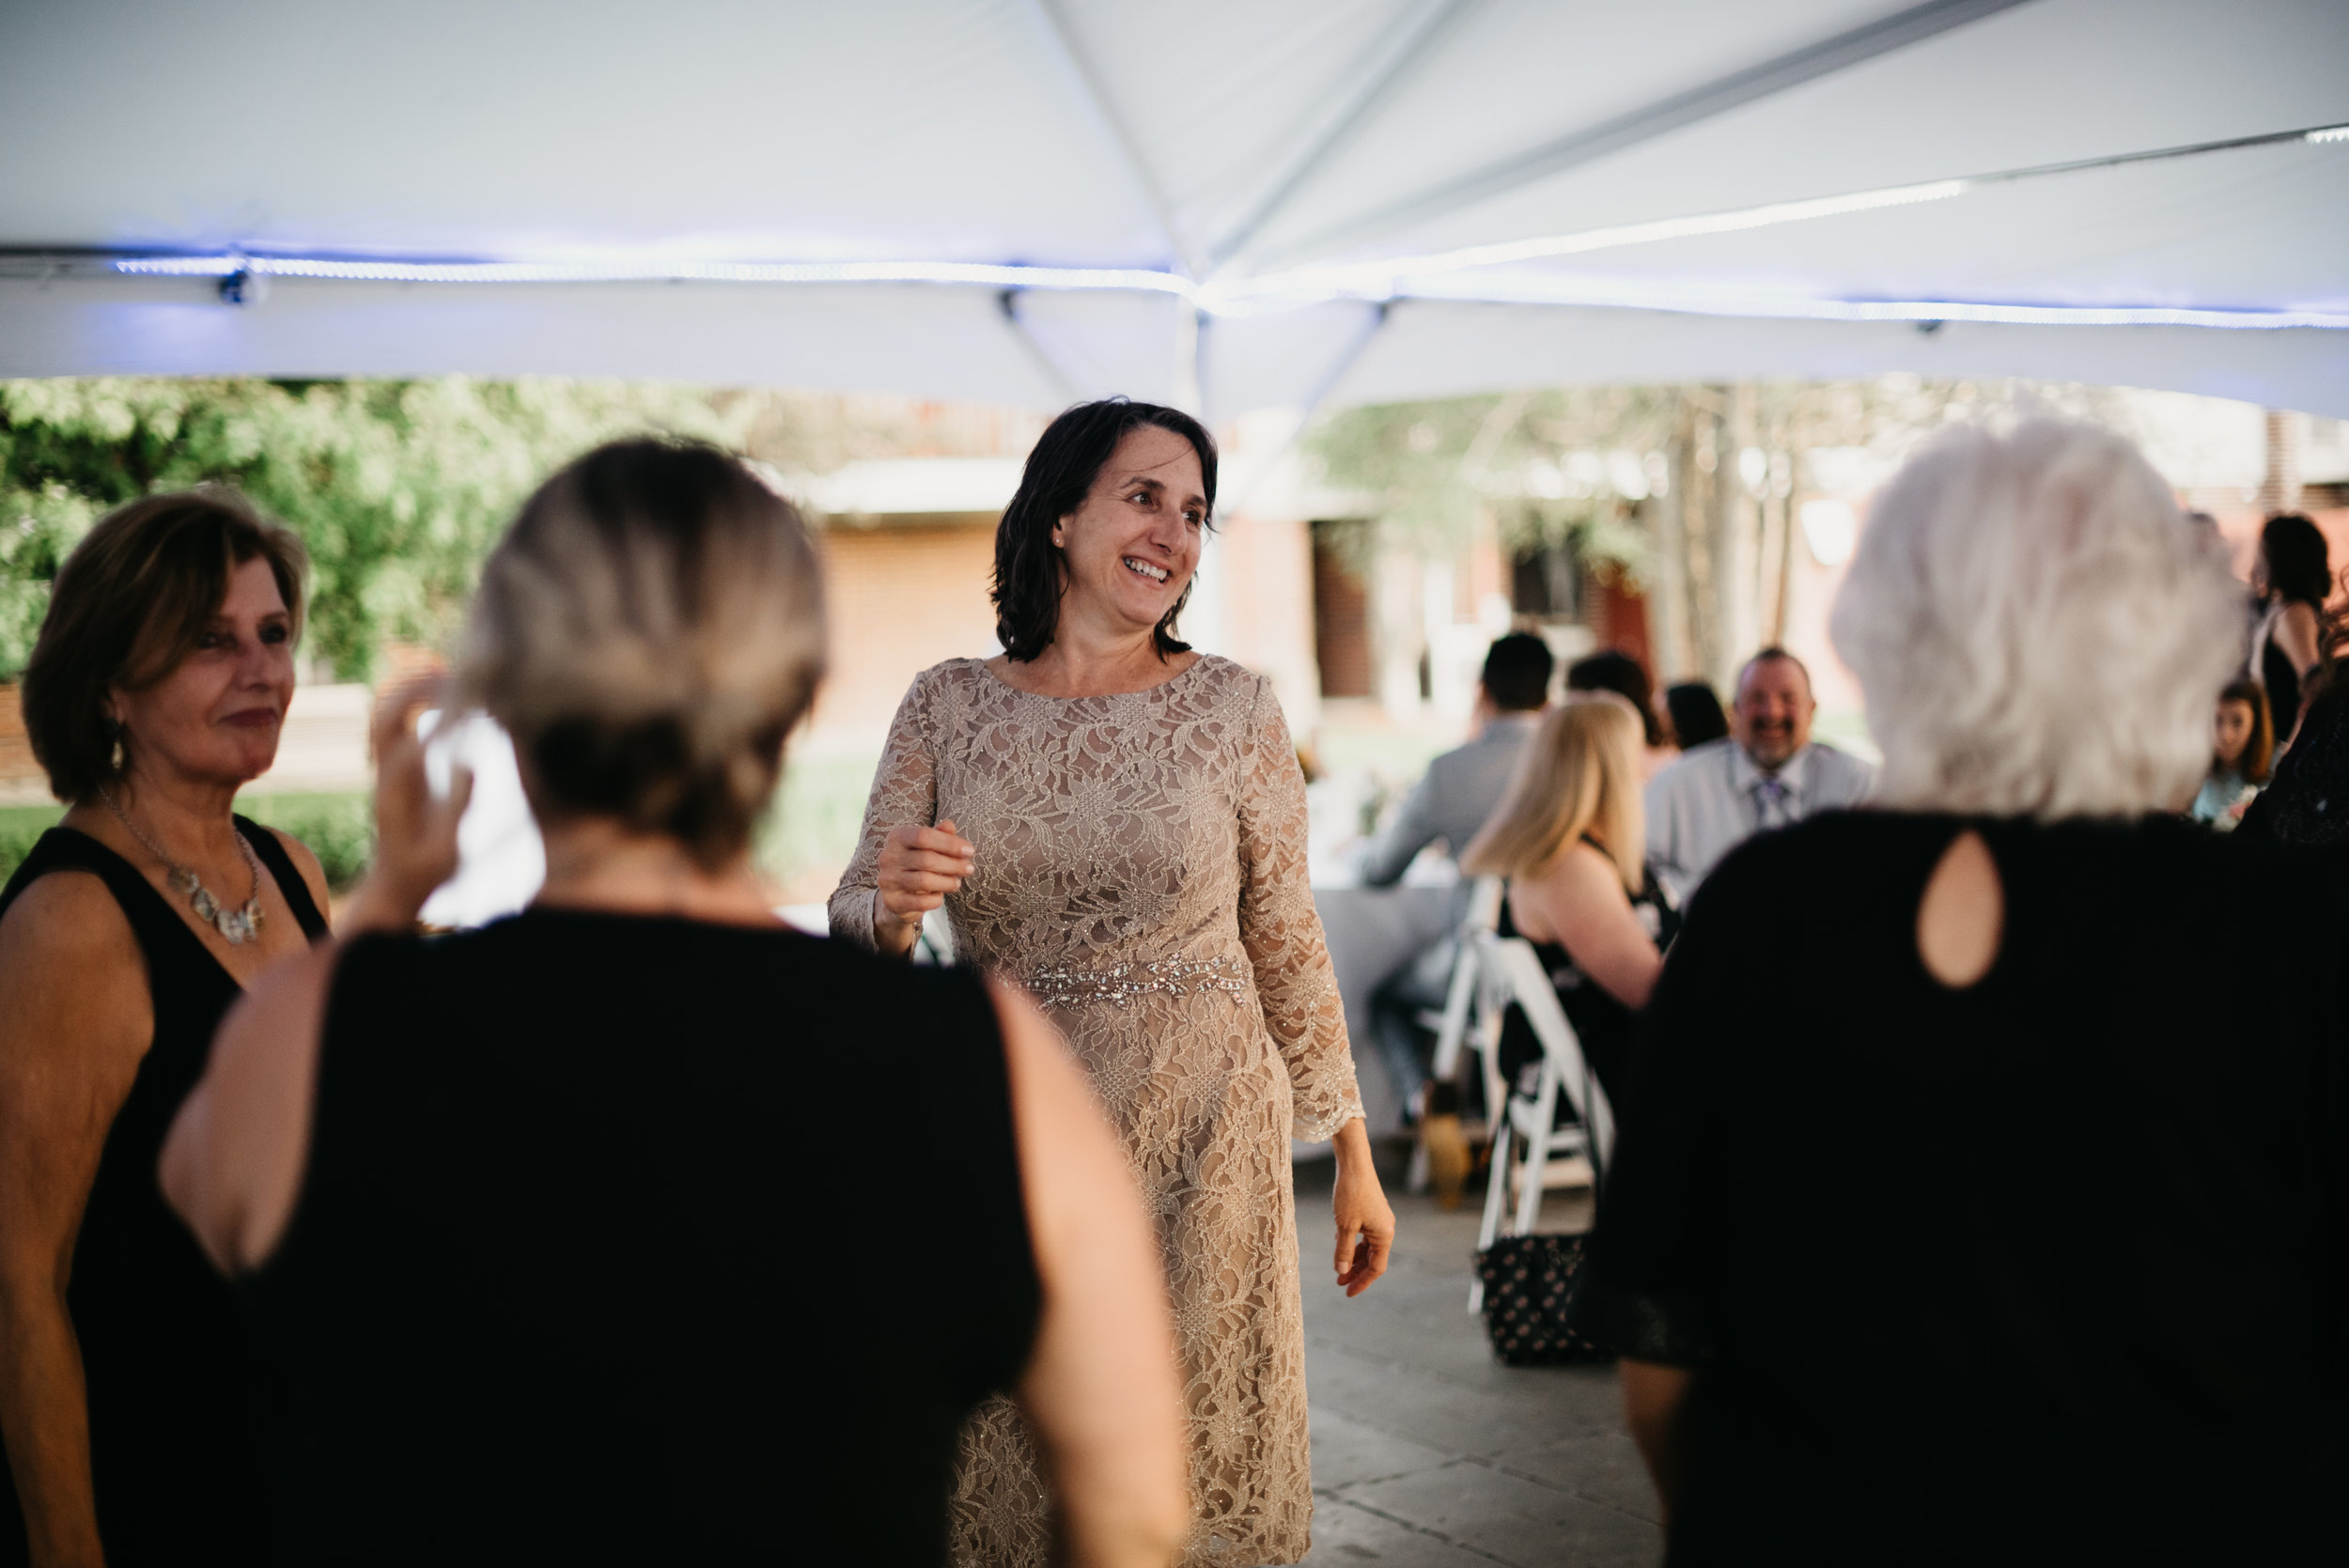 Barch-Massachusetts-Lakeside Tent Wedding-Western Massachusetts Wedding Photographer-03456.jpg